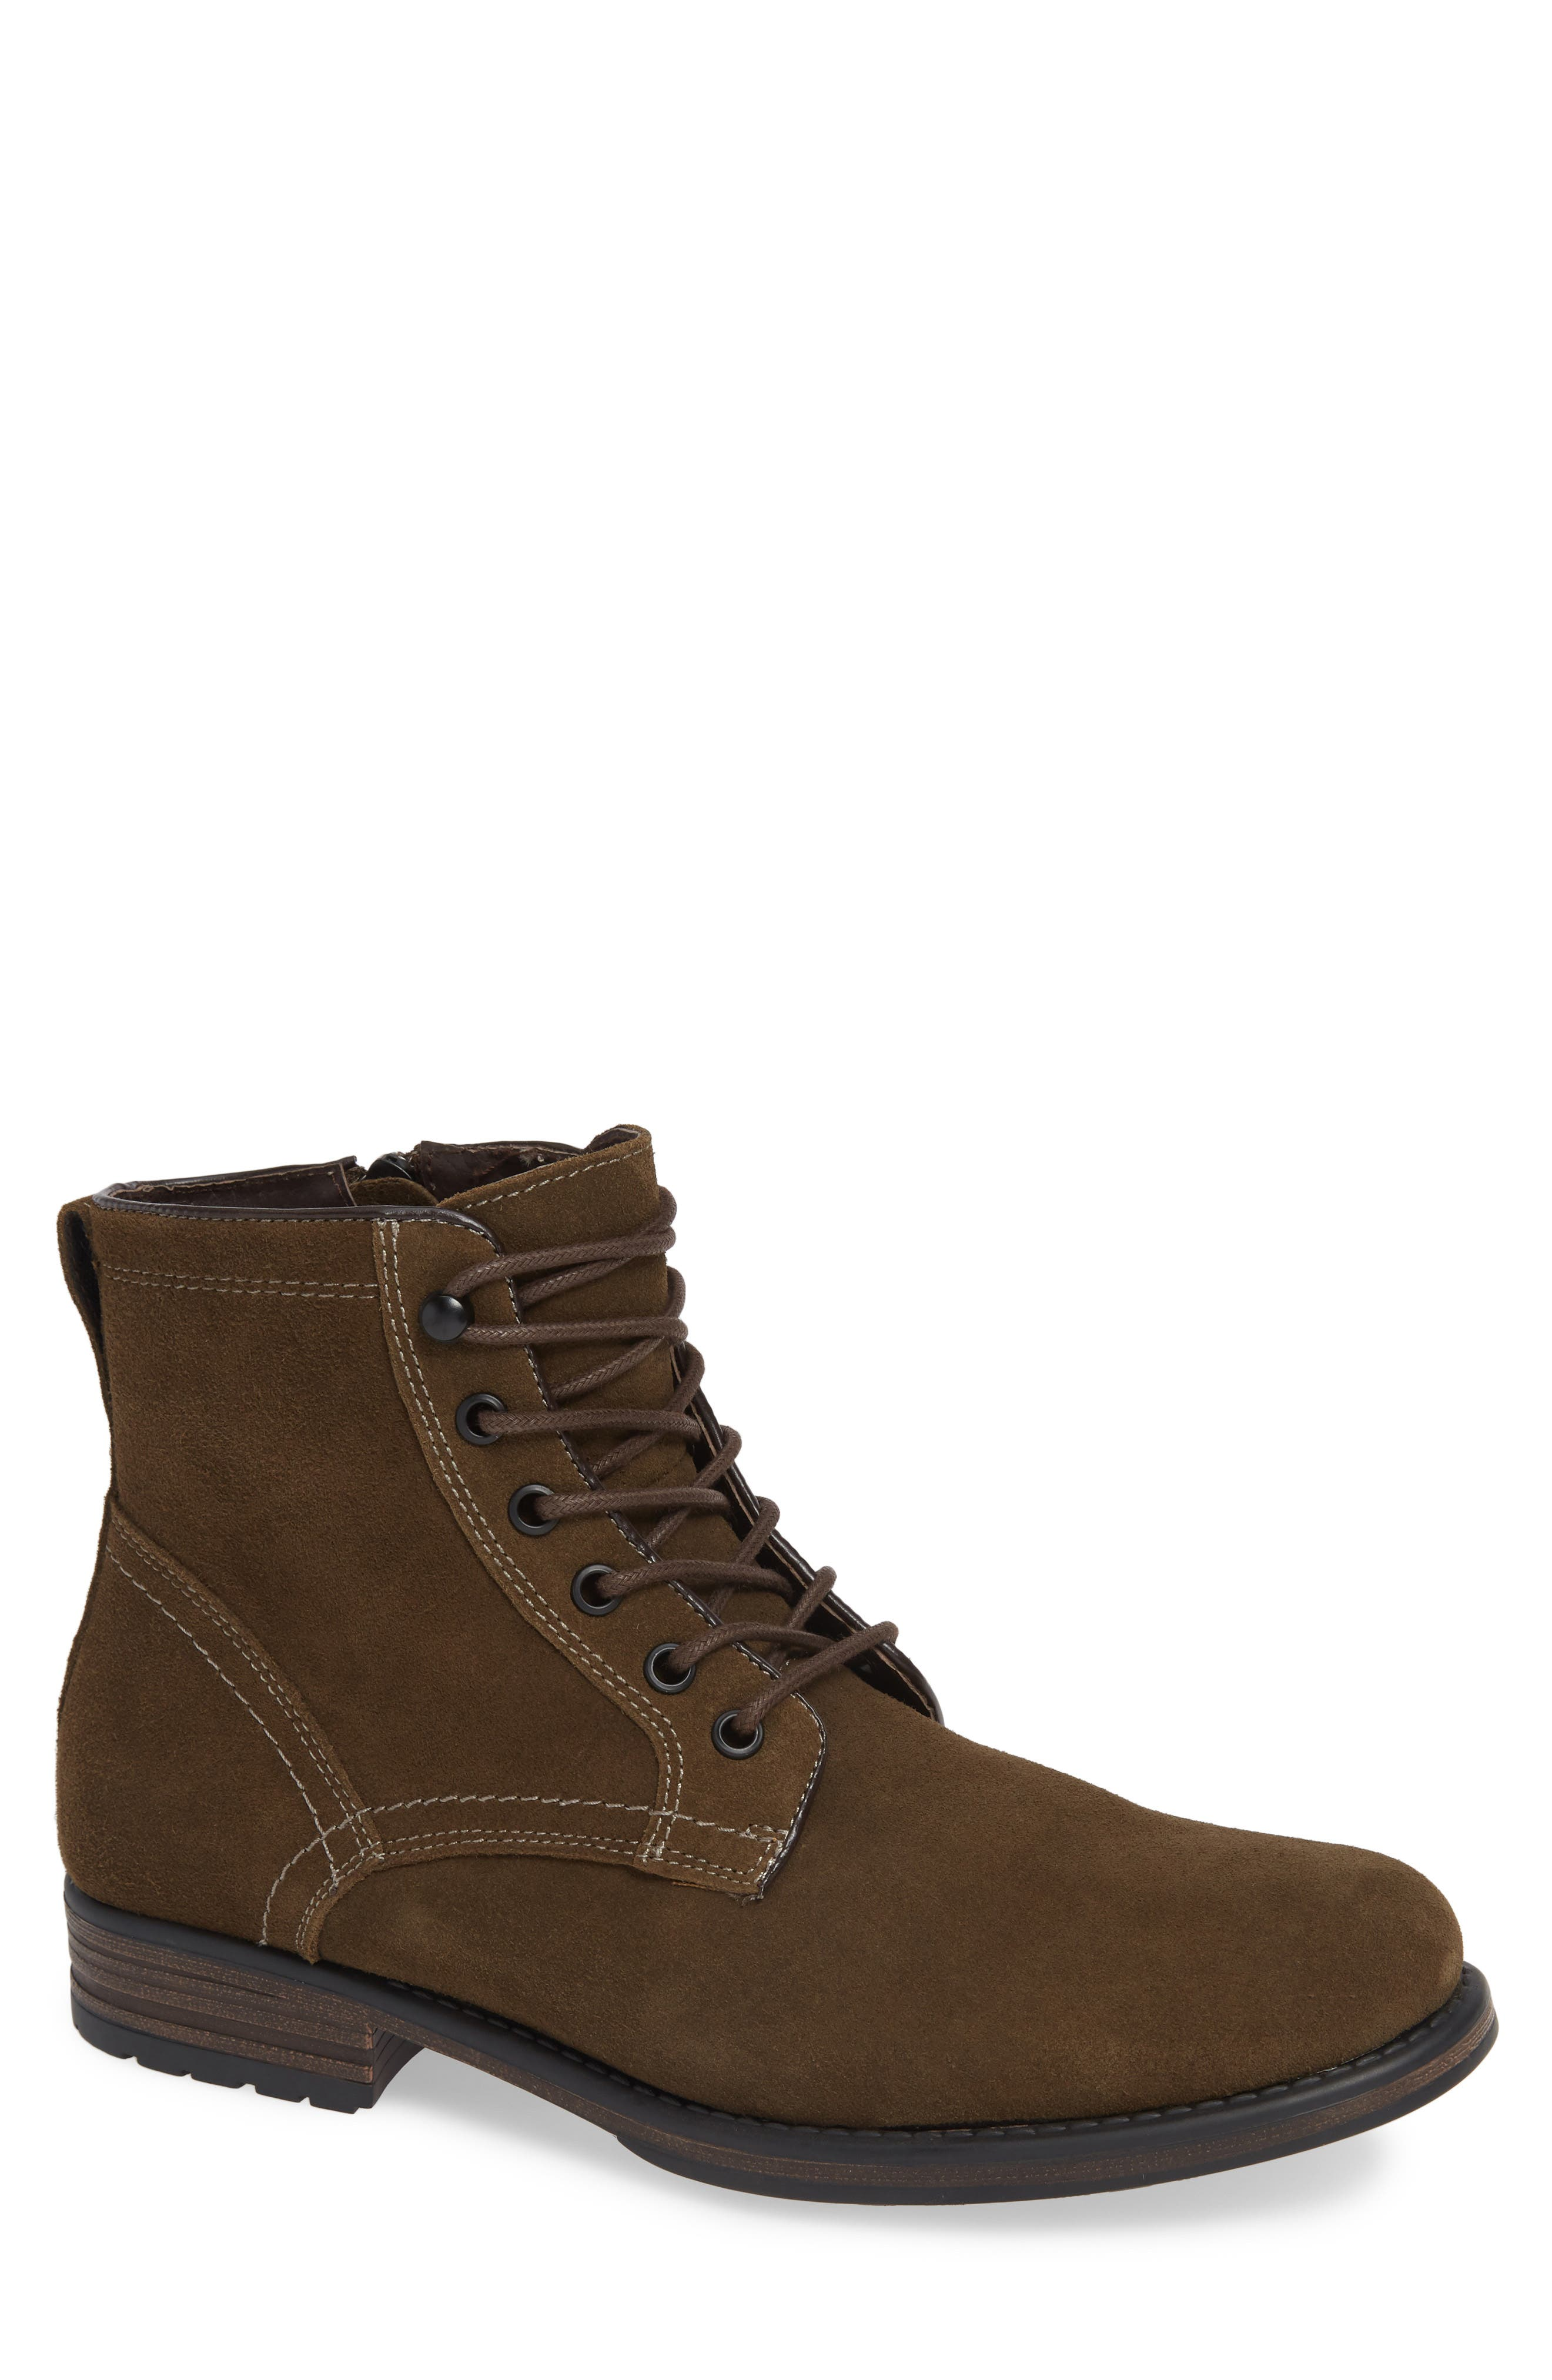 Blondo Peter Waterproof Plain Toe Boot- Brown